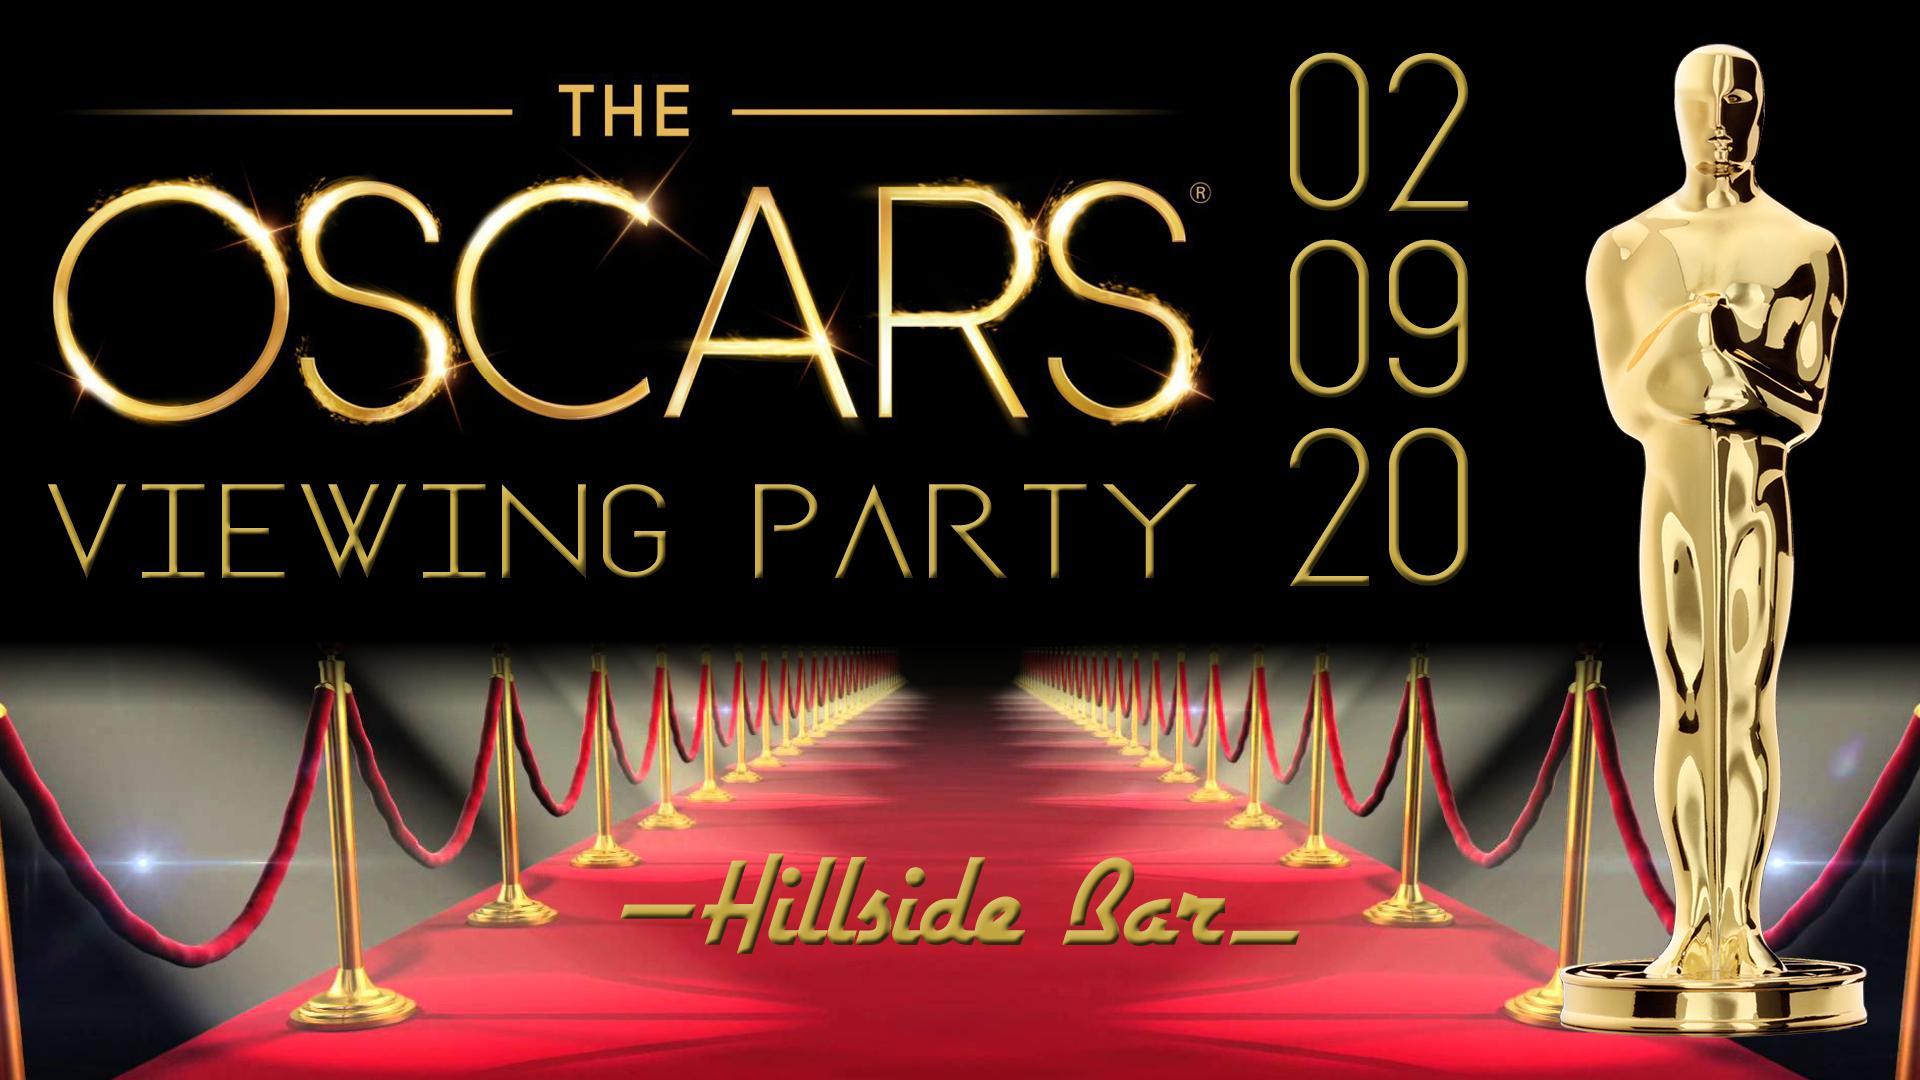 Hillside Oscar Party 2020